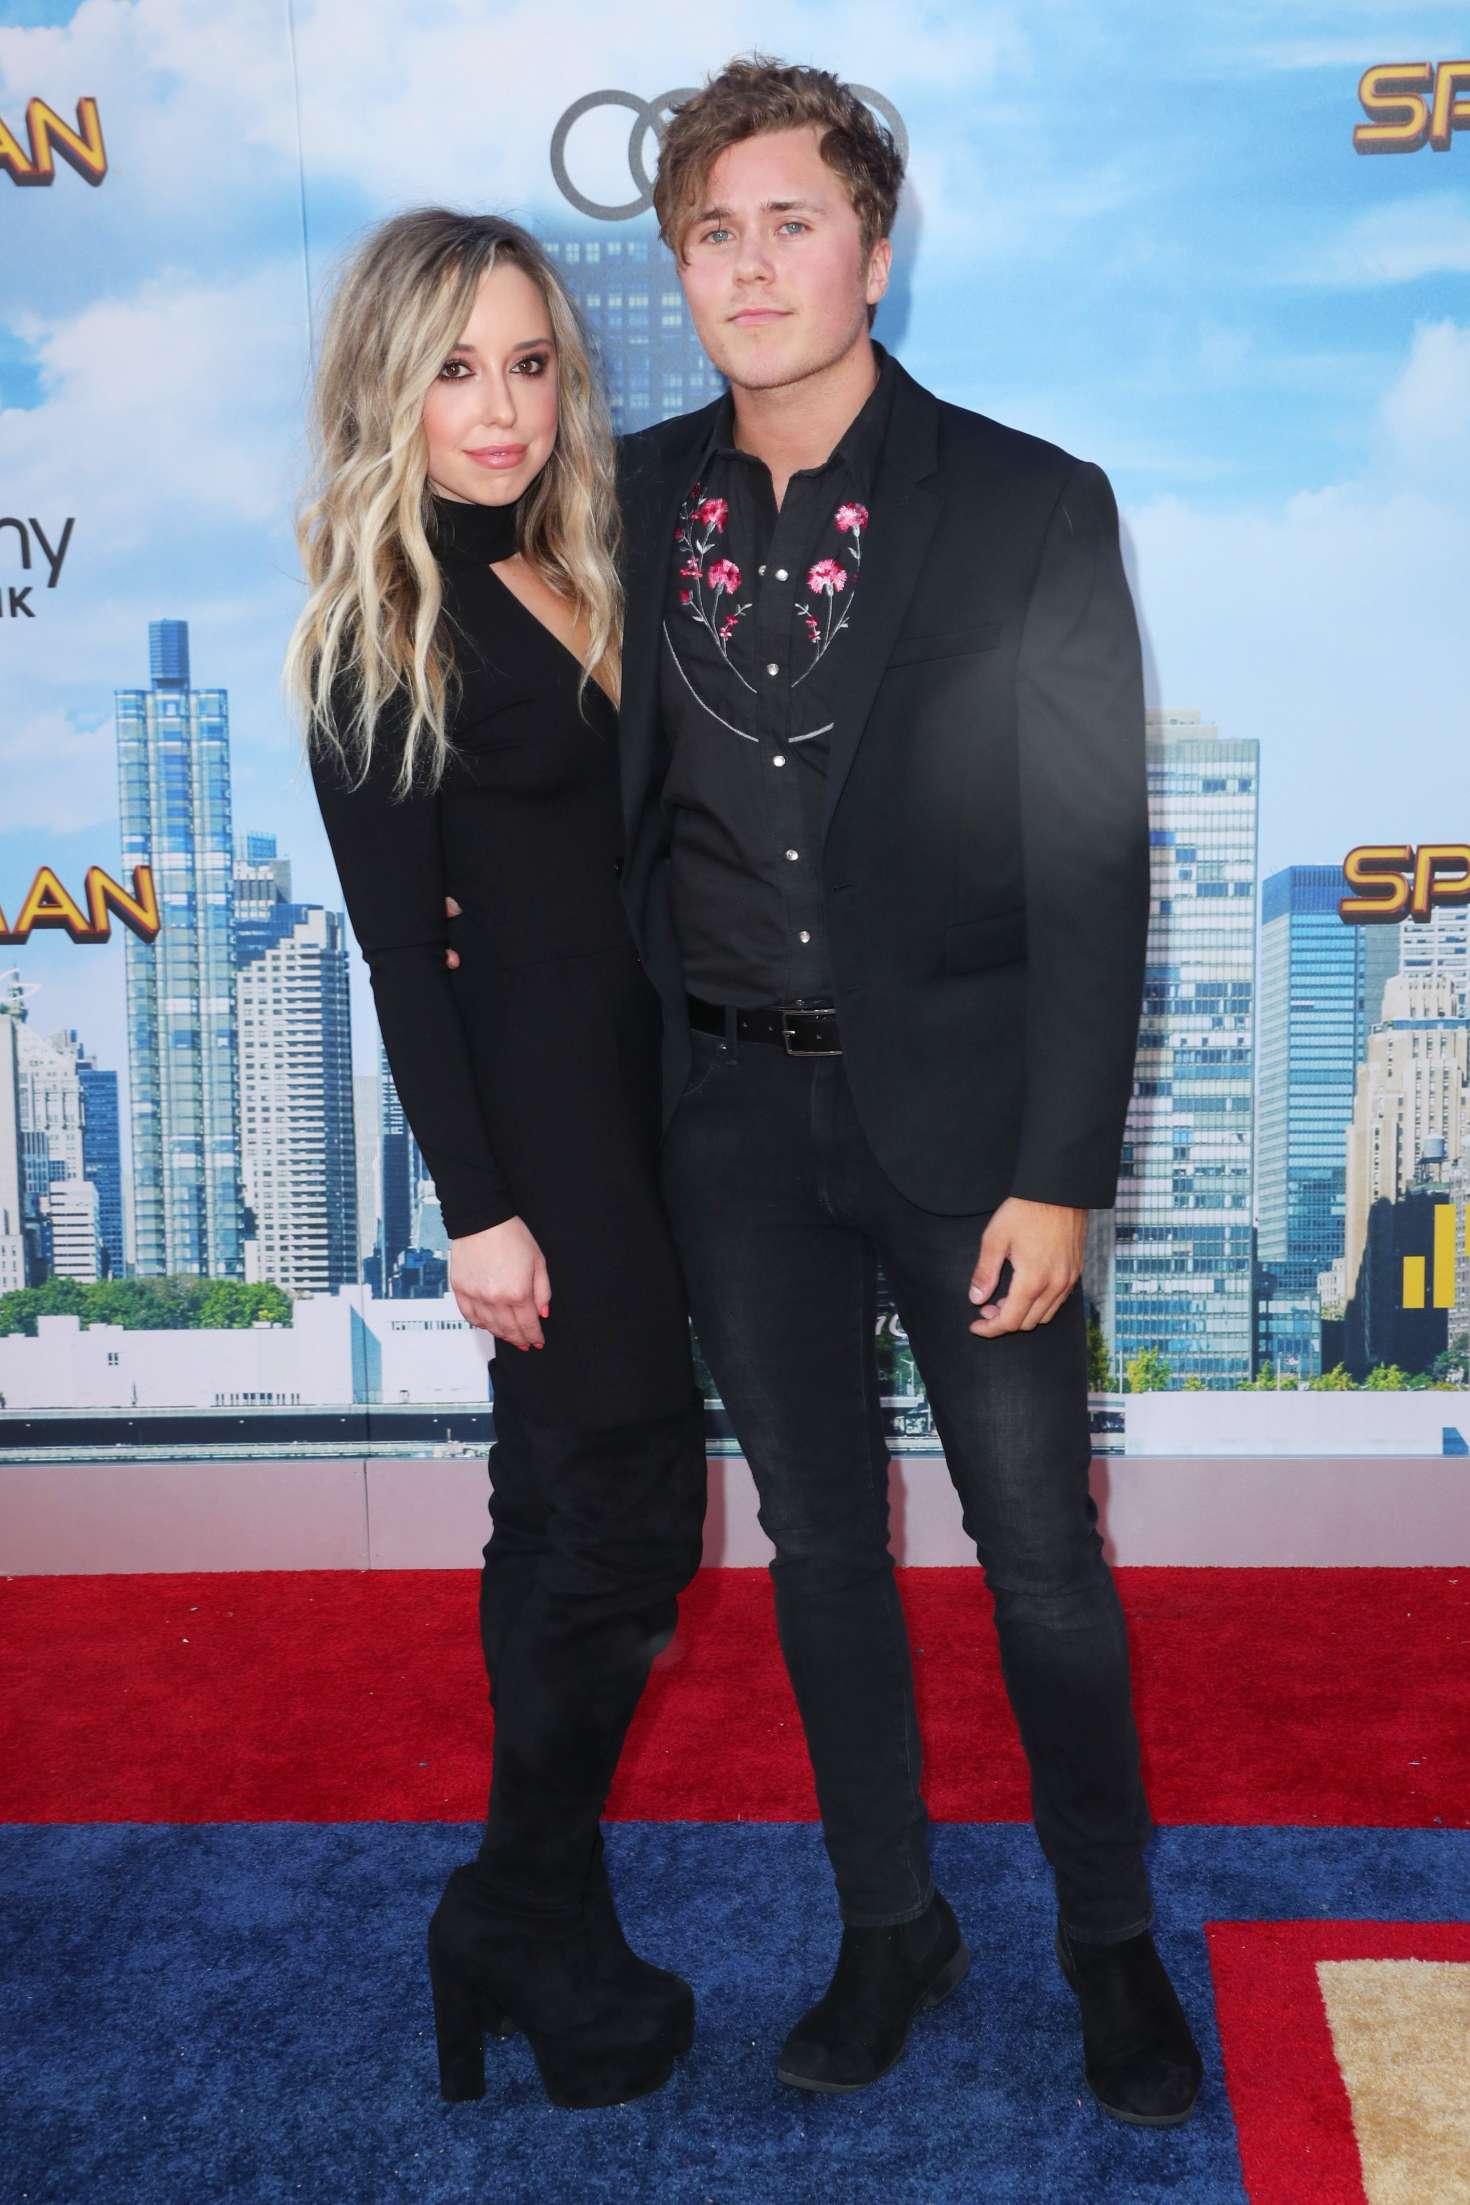 Skyler Shaye 2017 : Skyler Shaye: Spider-Man: Homecoming Premiere in Hollywood -06